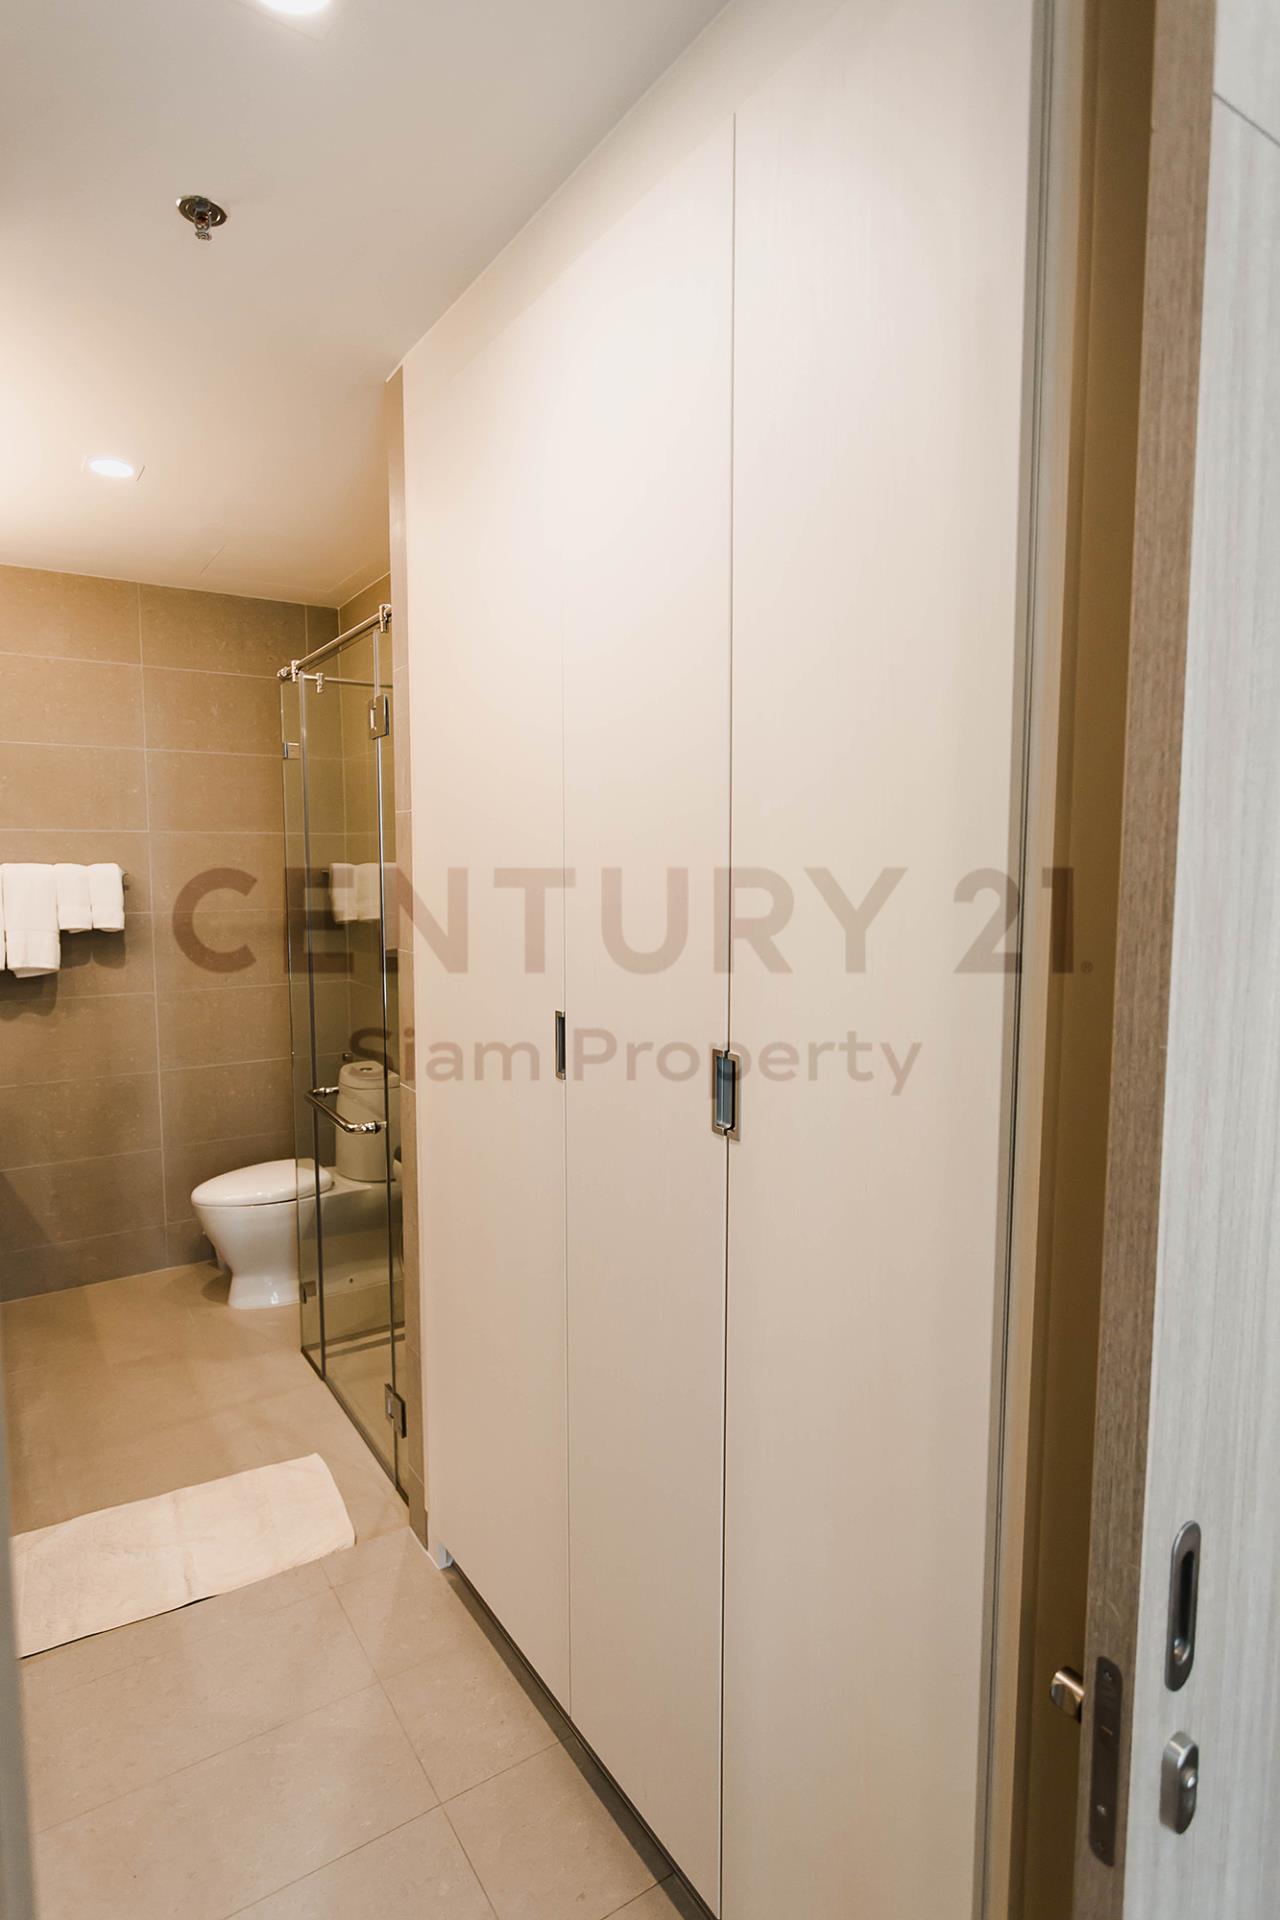 Century21 Siam Property Agency's Noble Ploenchit 18